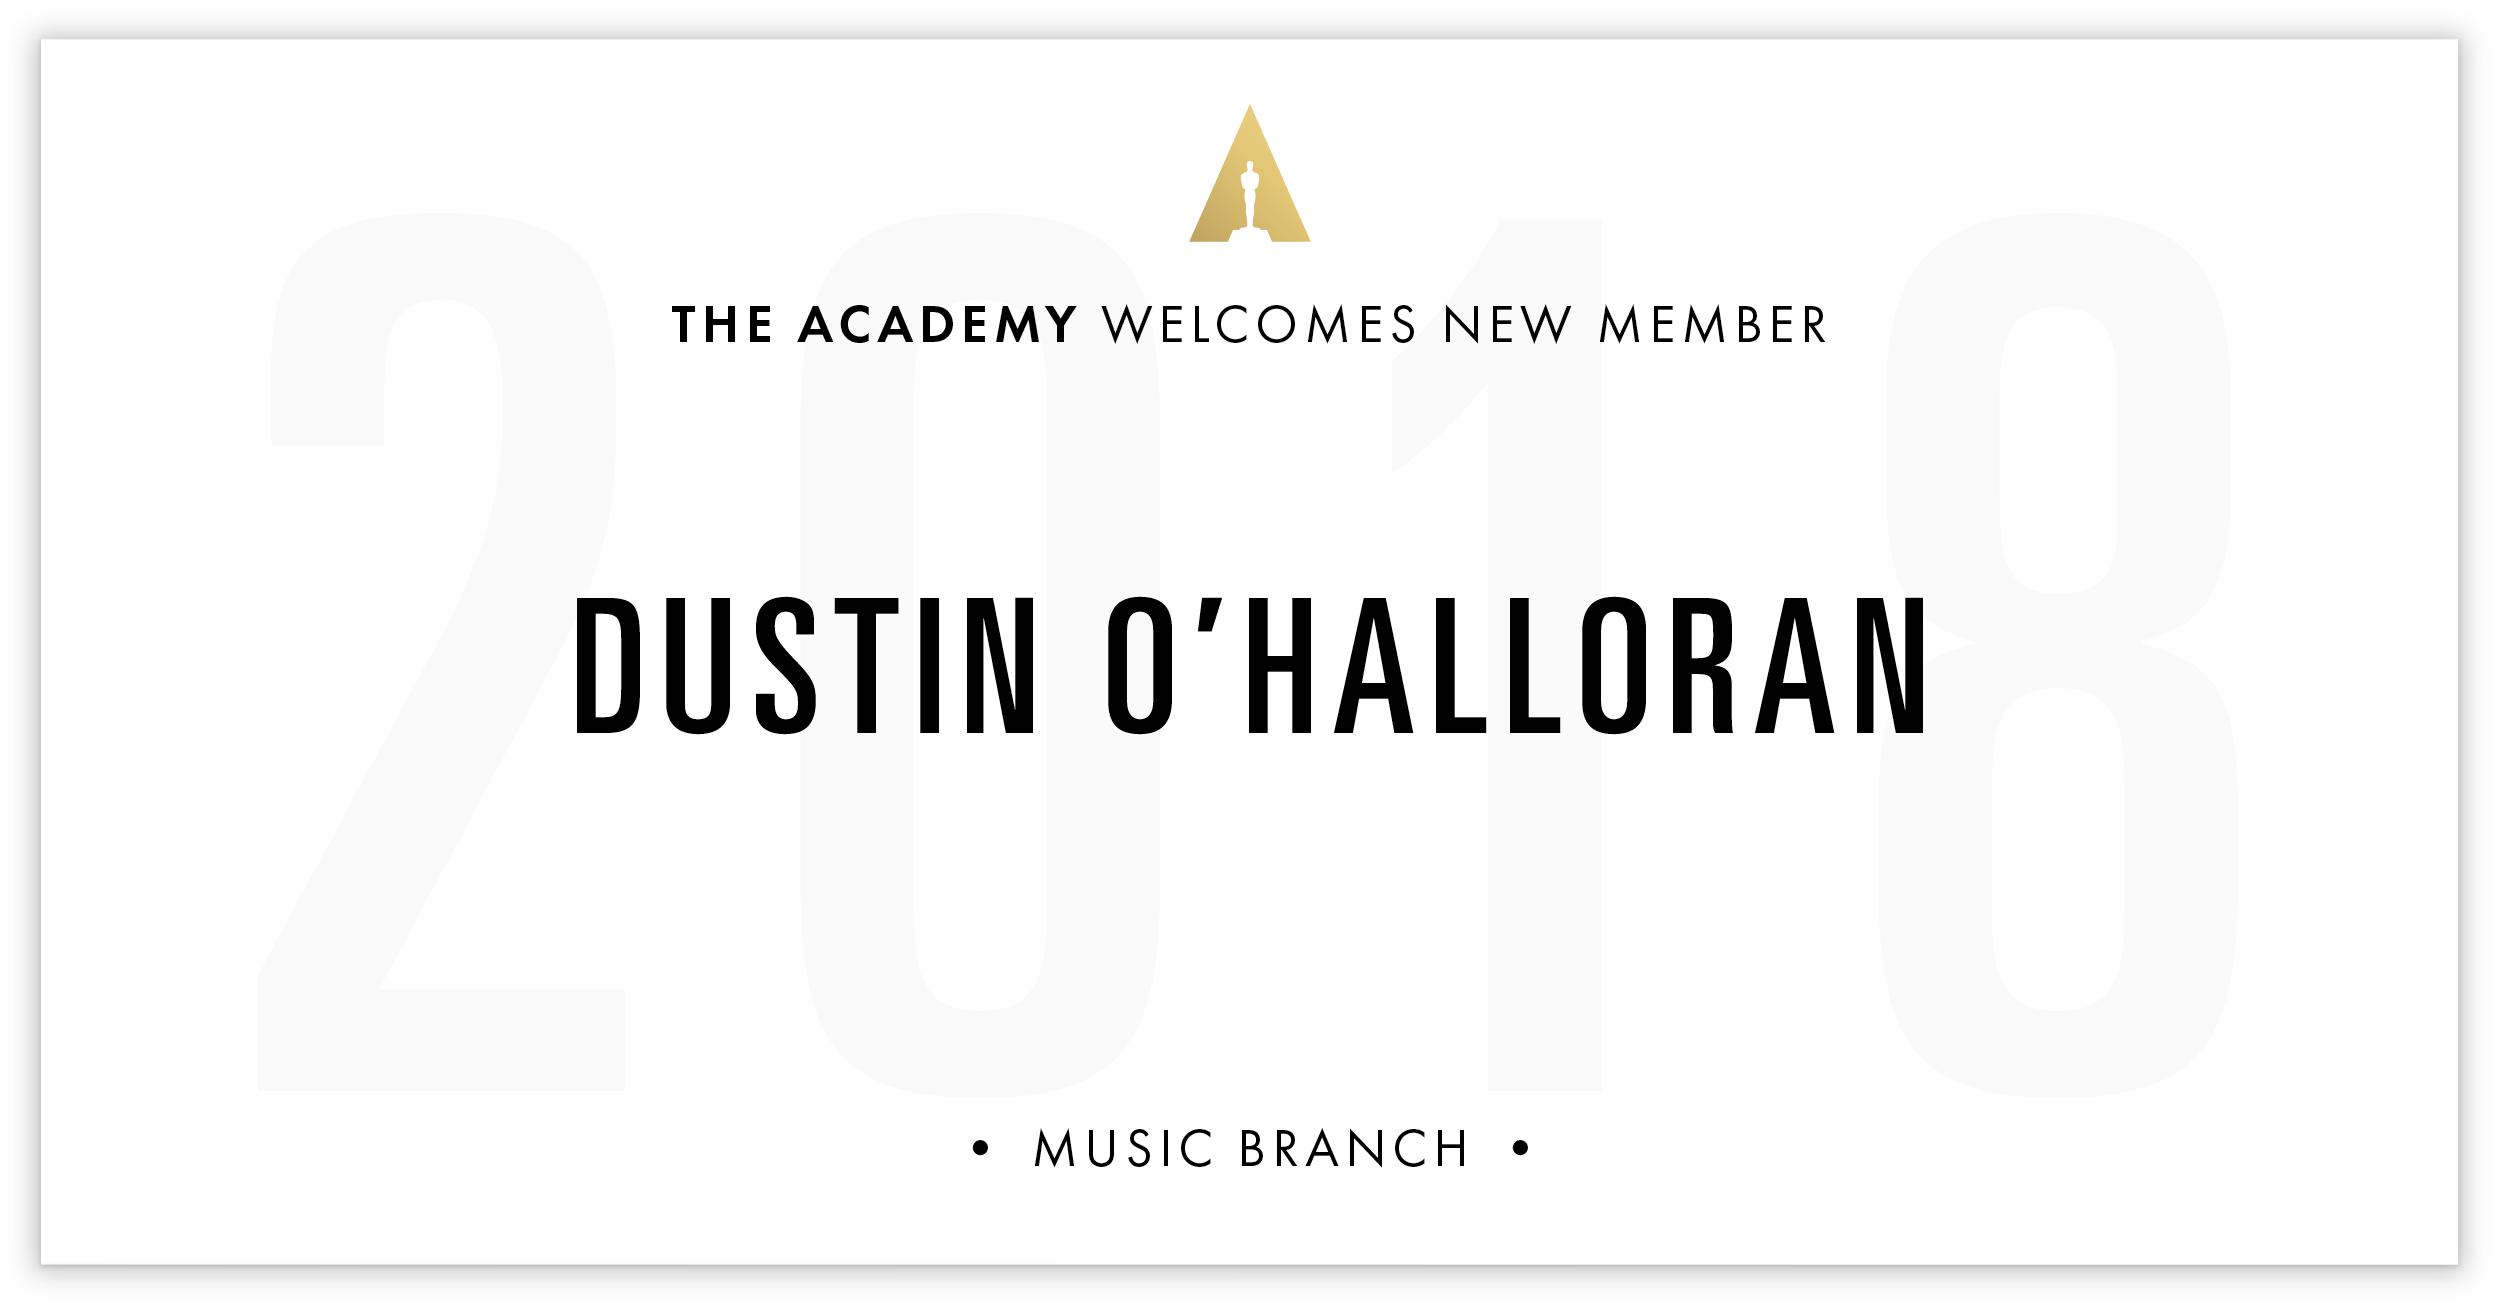 Dustin O'Halloran is invited!